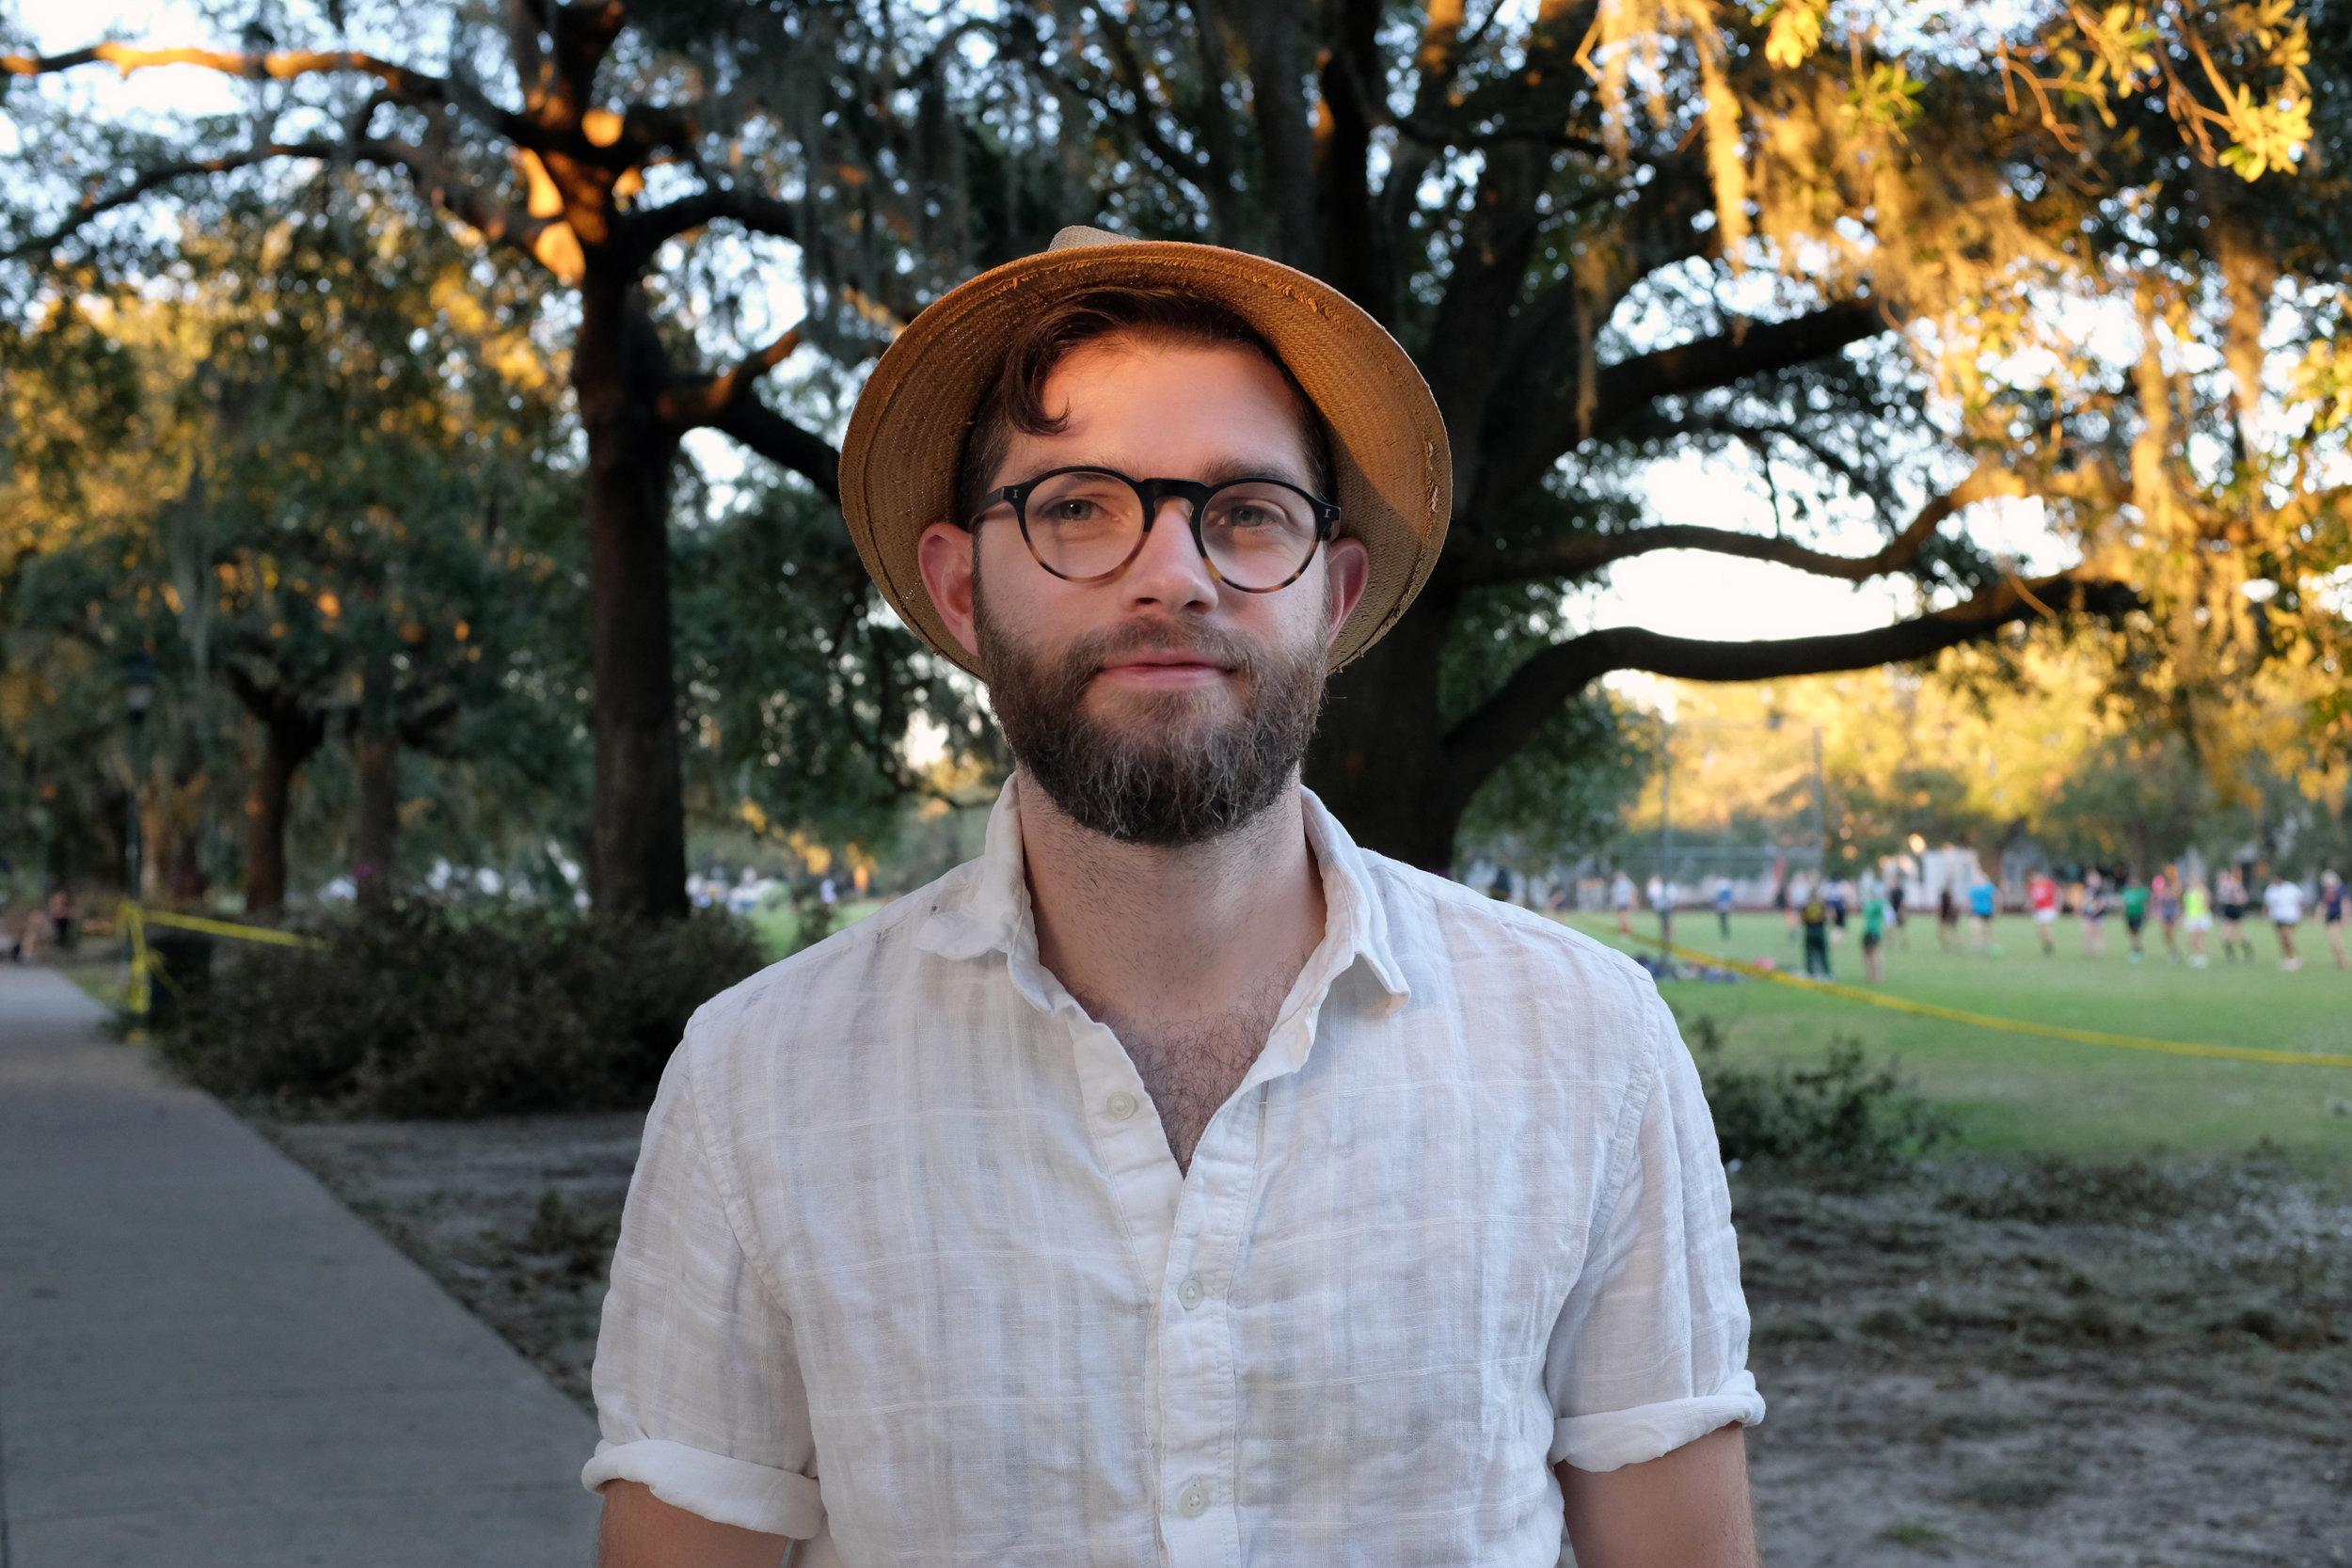 Conor_Walk_Savannah.jpg